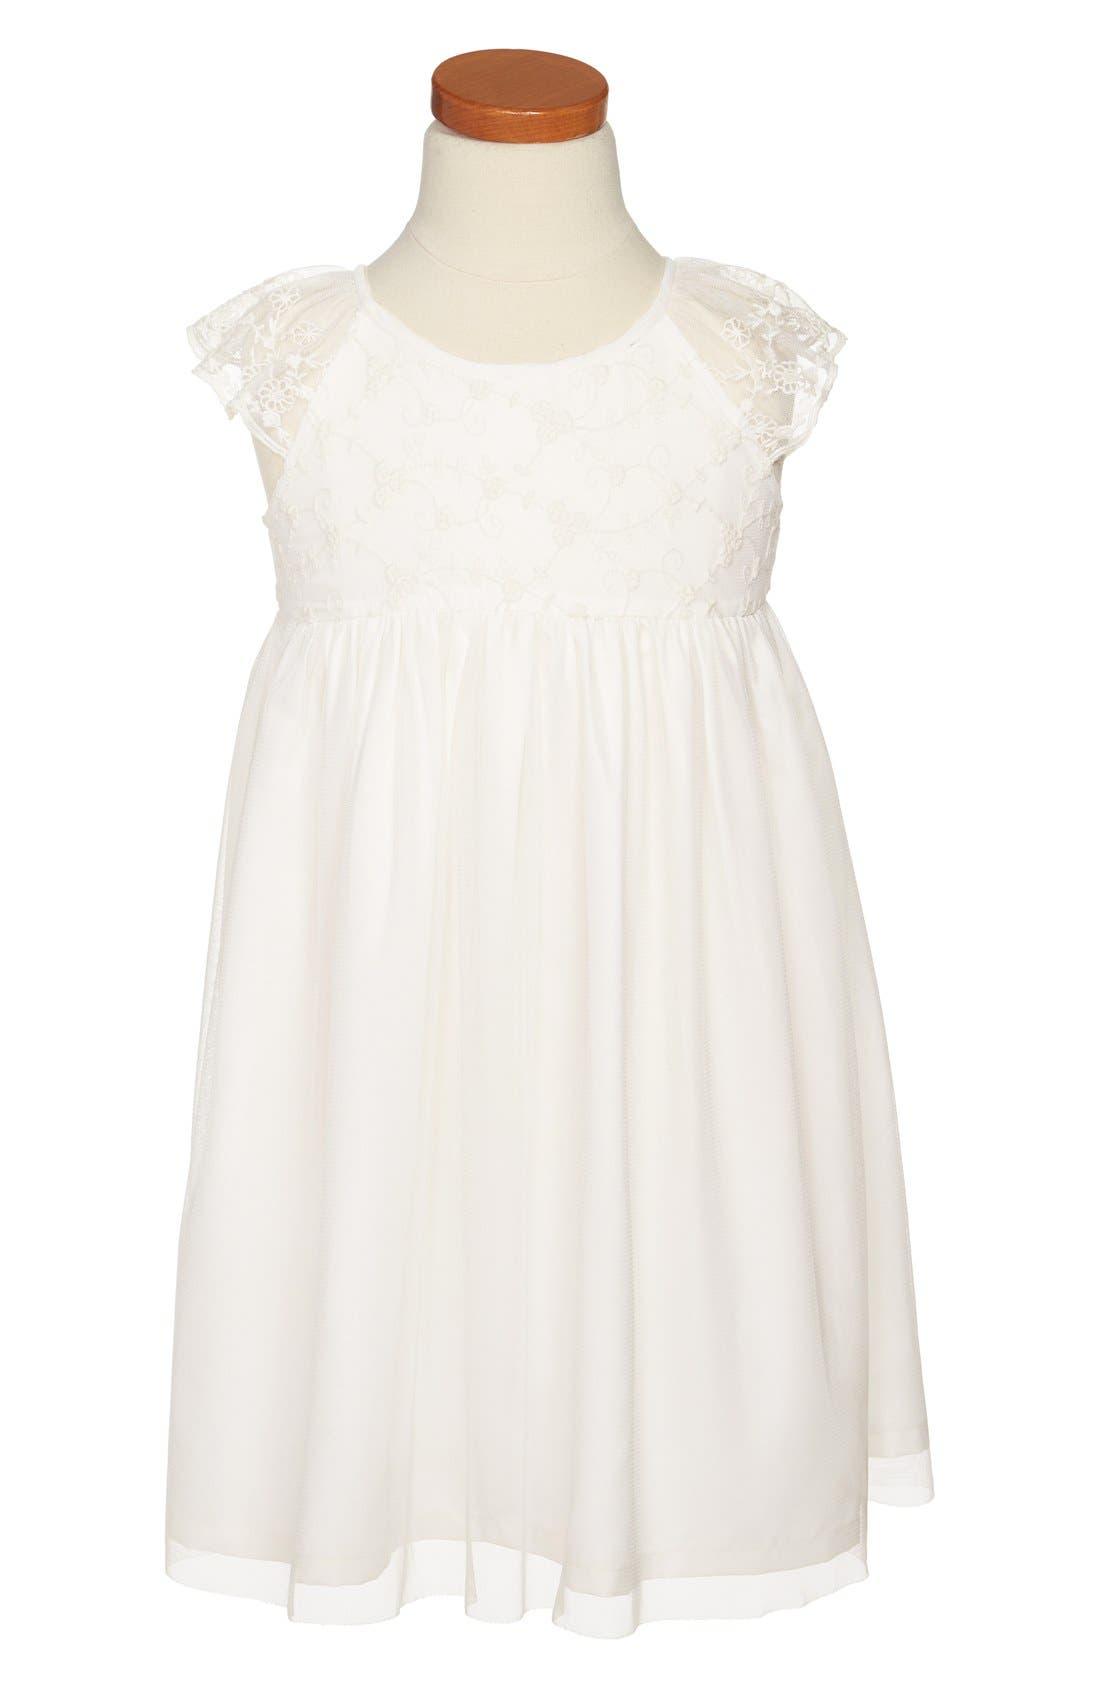 Alternate Image 1 Selected - Ruby & Bloom 'Joie' Dress (Toddler Girls, Little Girls & Big Girls)